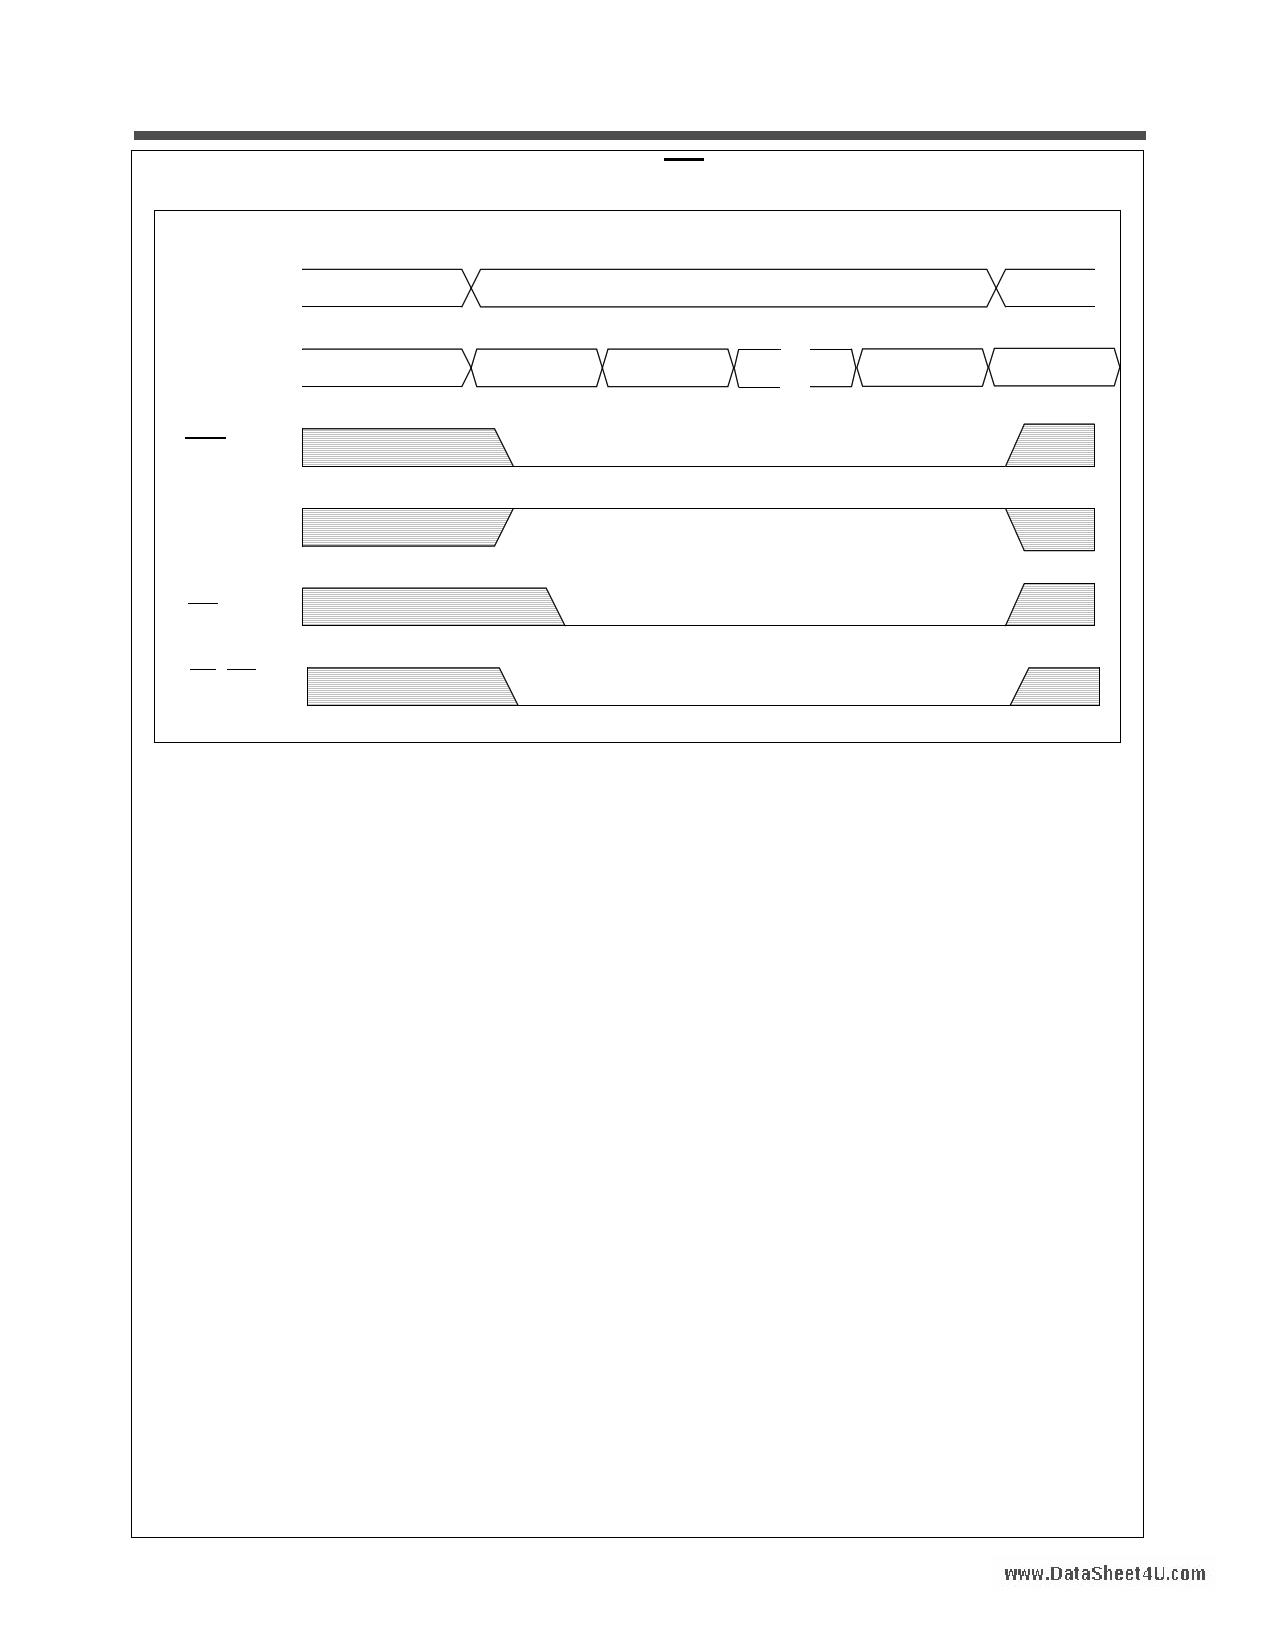 N01L163WC2A pdf, arduino